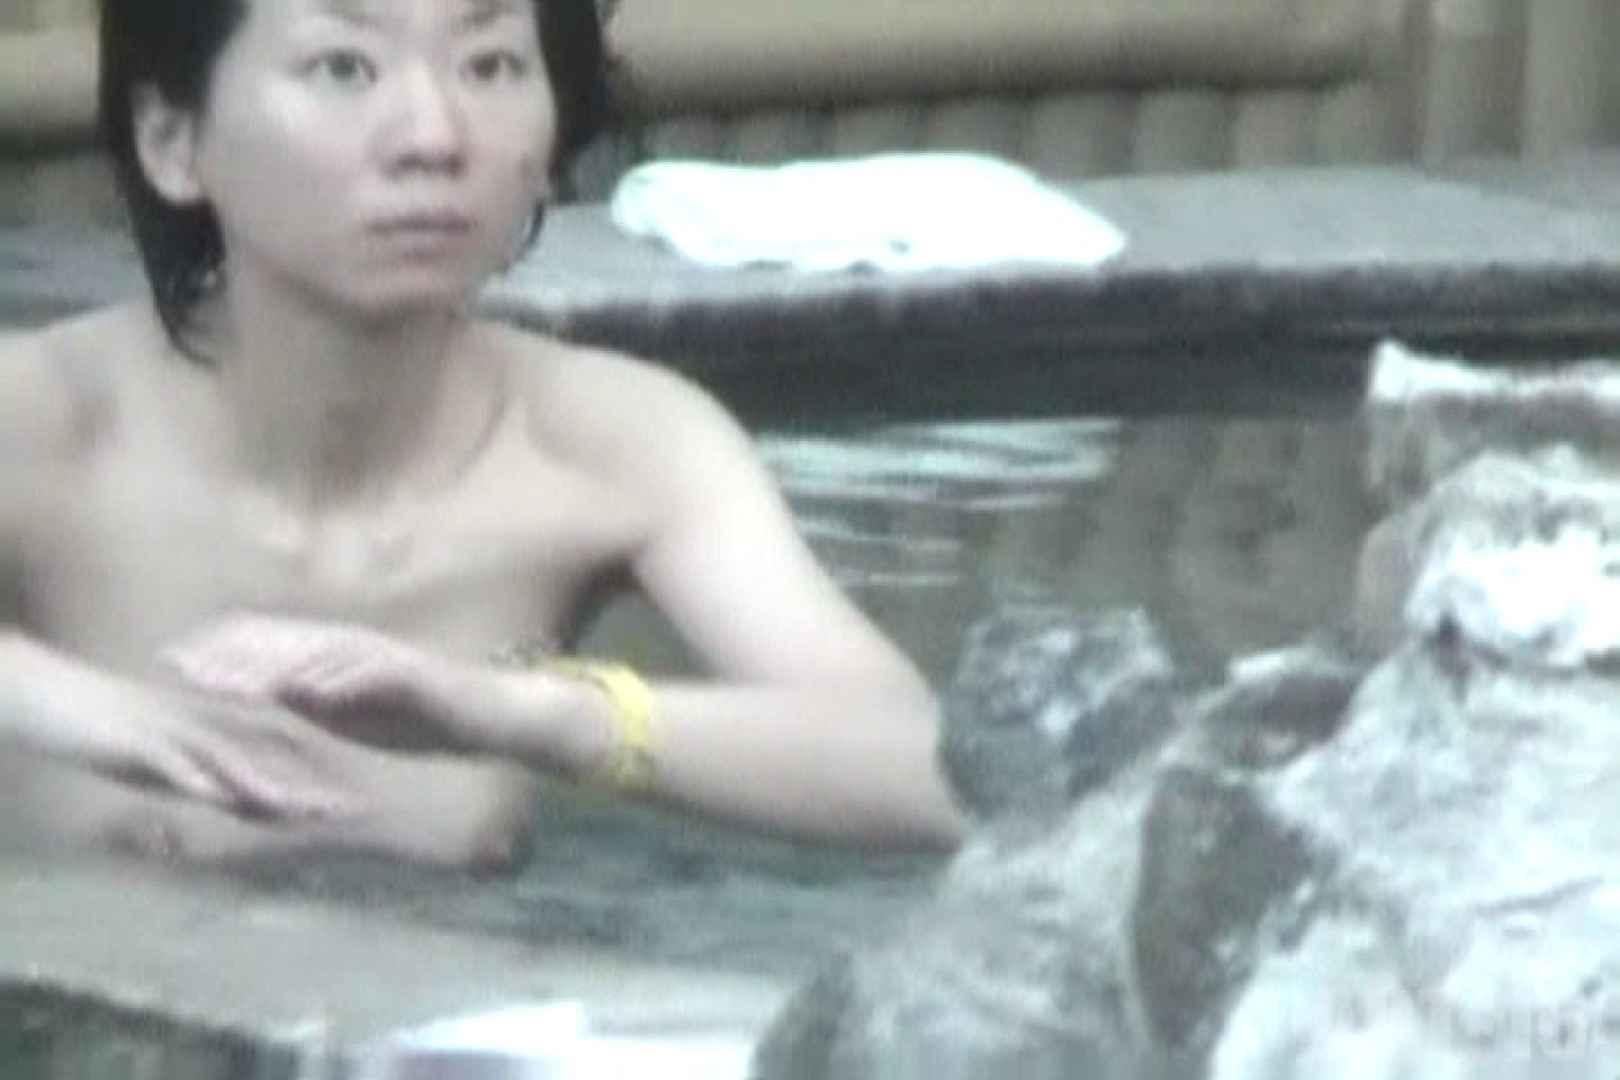 Aquaな露天風呂Vol.842 露天風呂編 | 盗撮シリーズ  82PIX 55